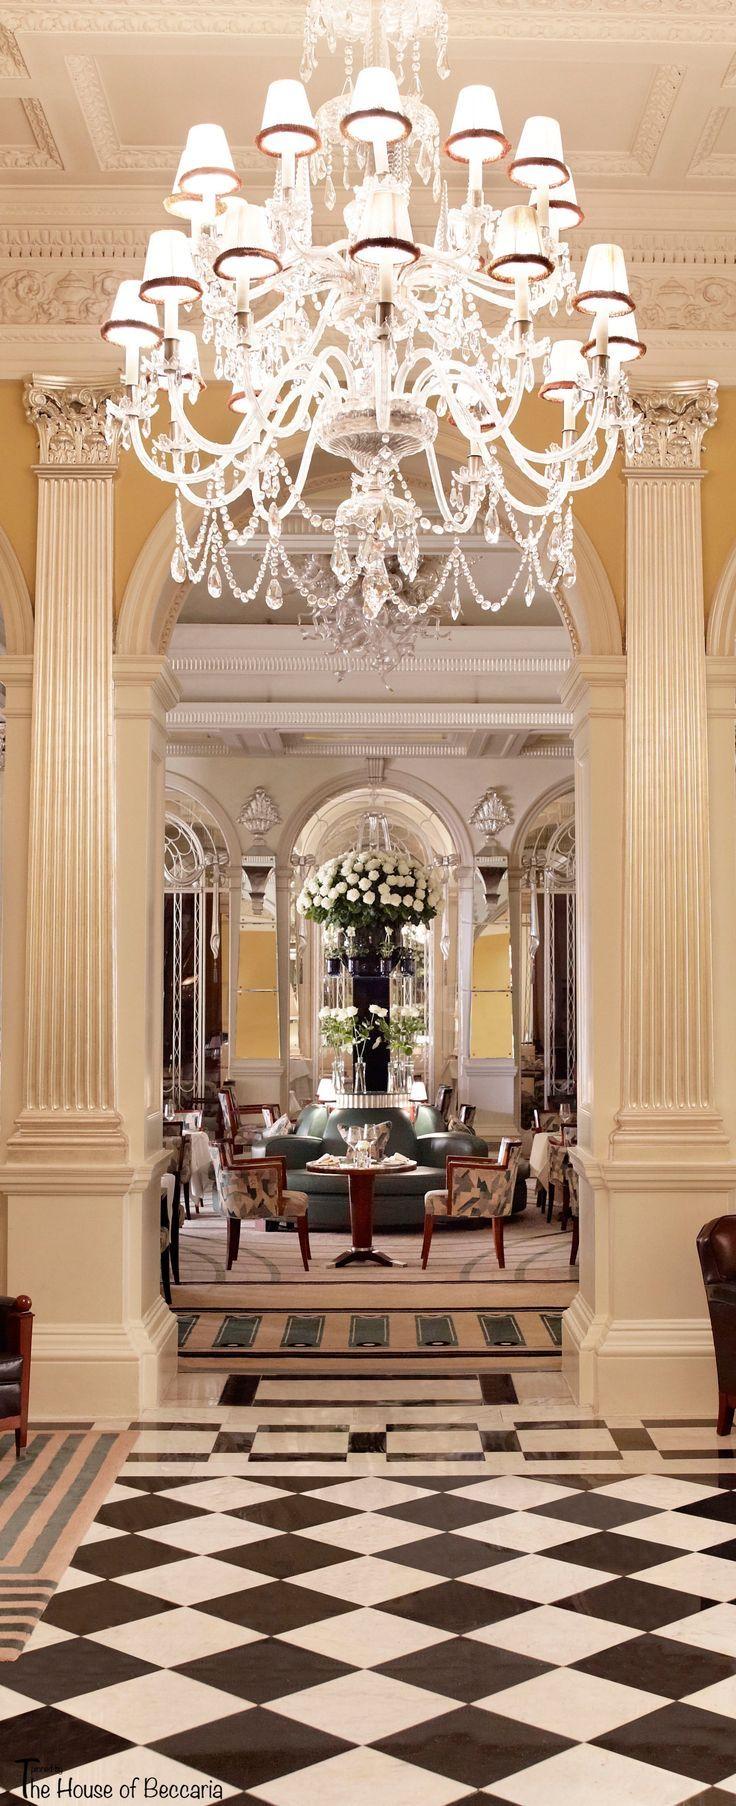 LUMA Luxury Matchmaking Locations